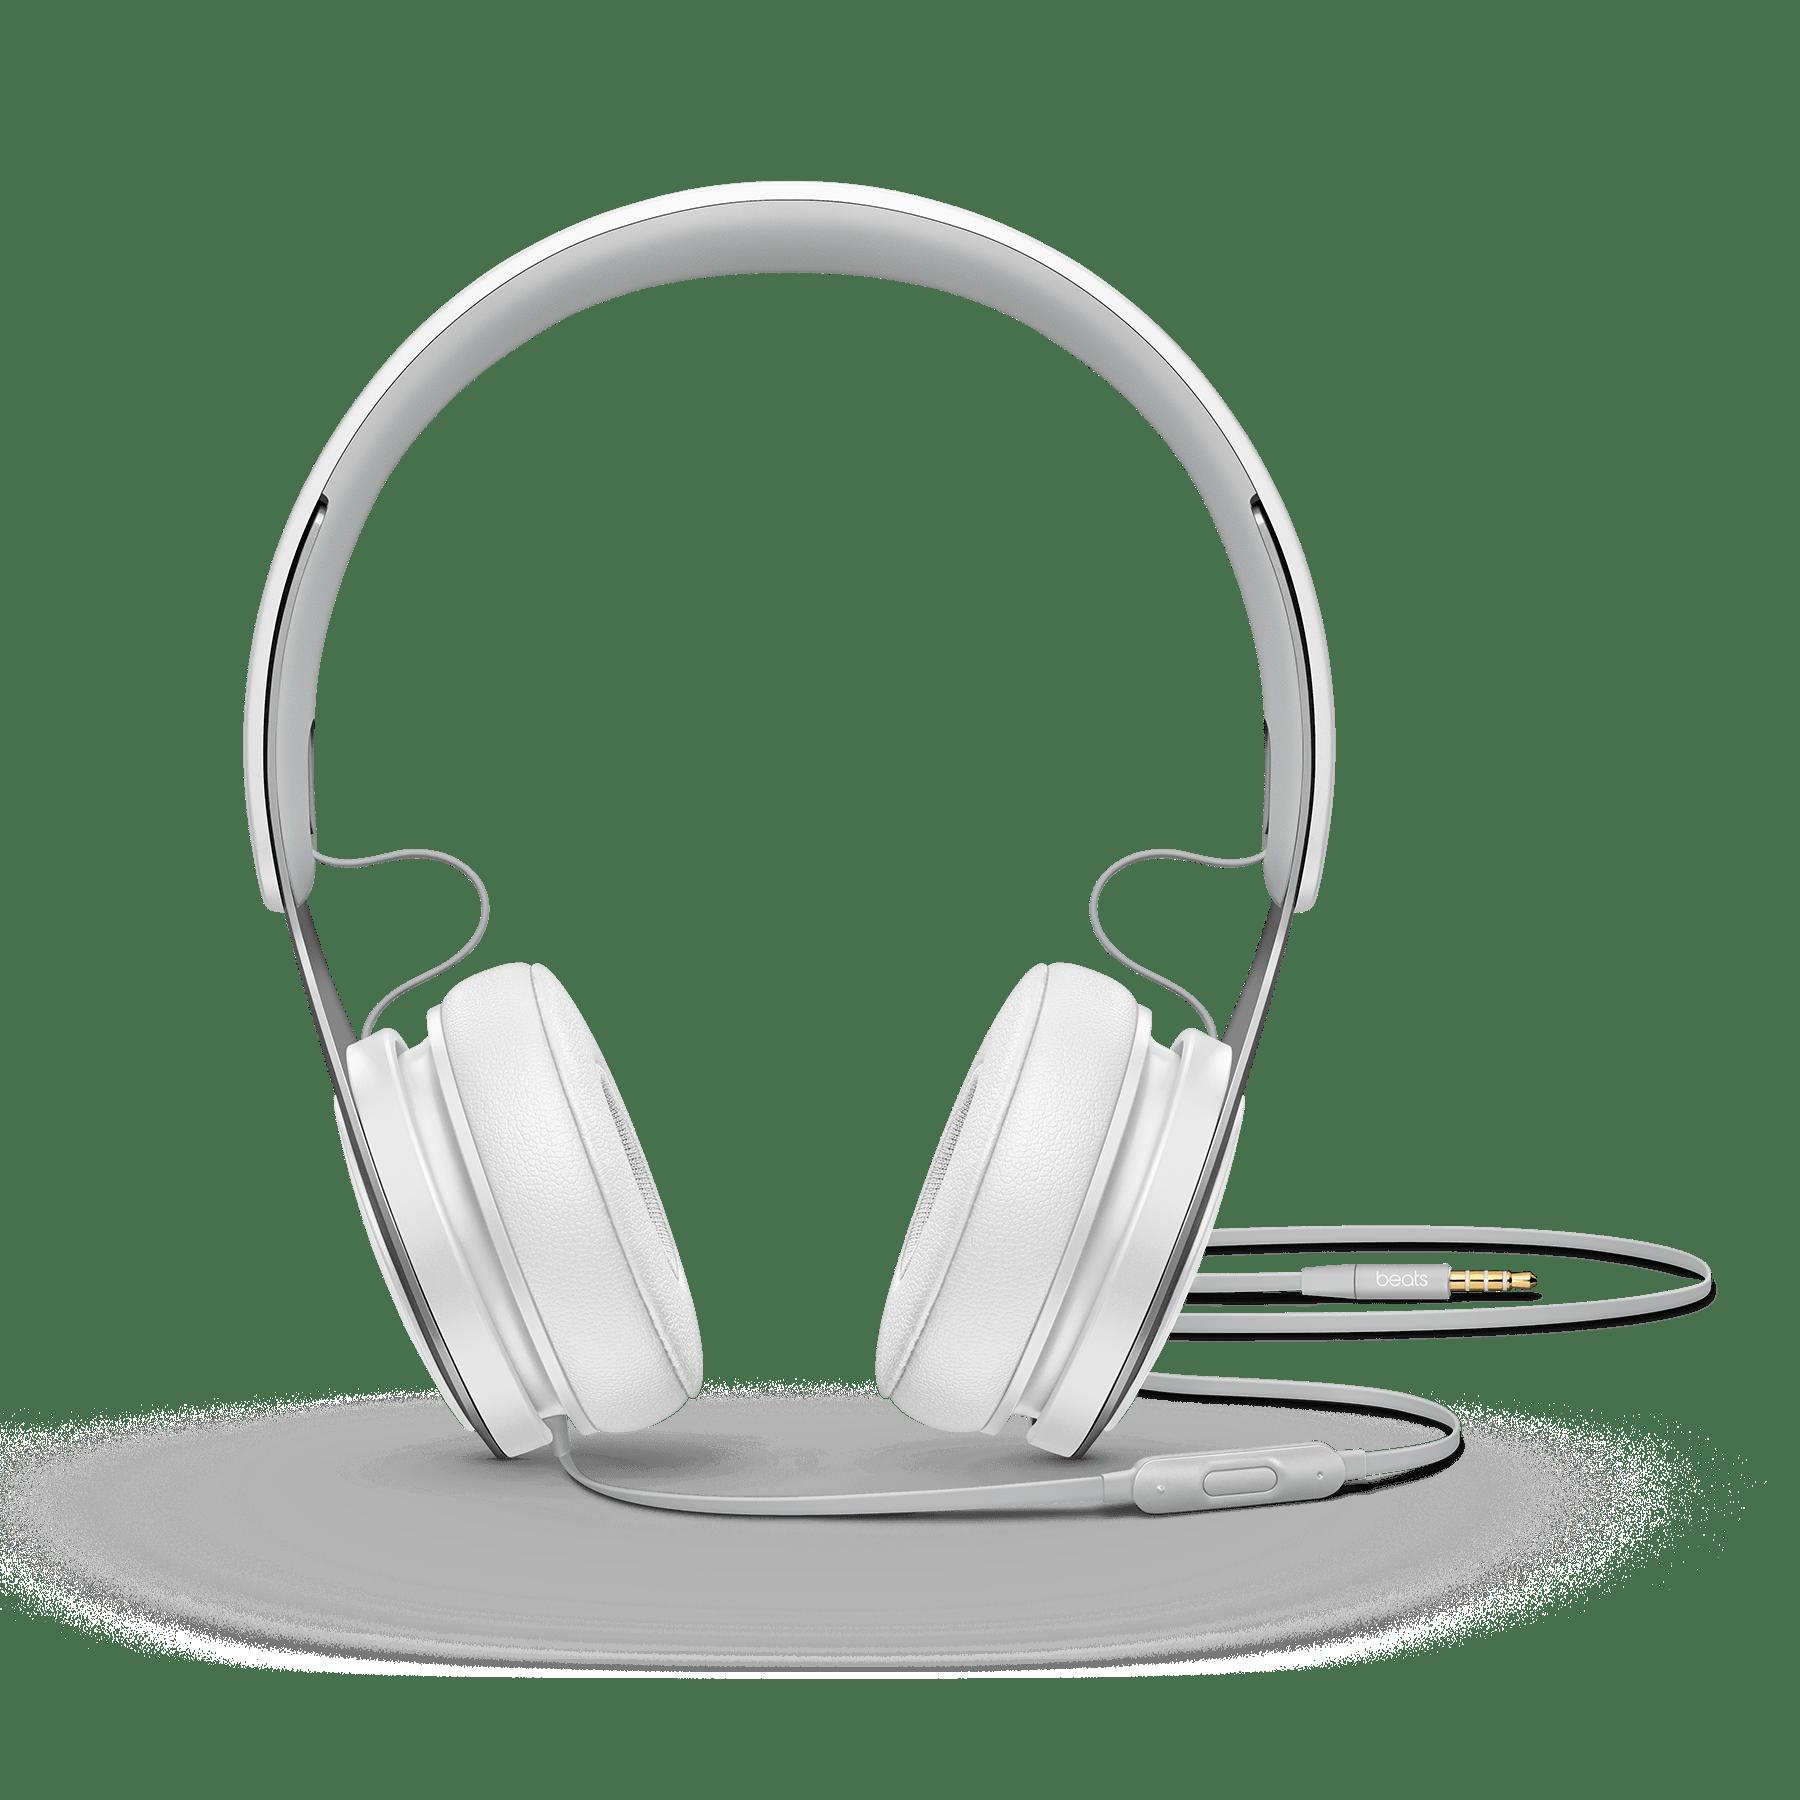 Ep by dre . Headphones clipart headphone beats